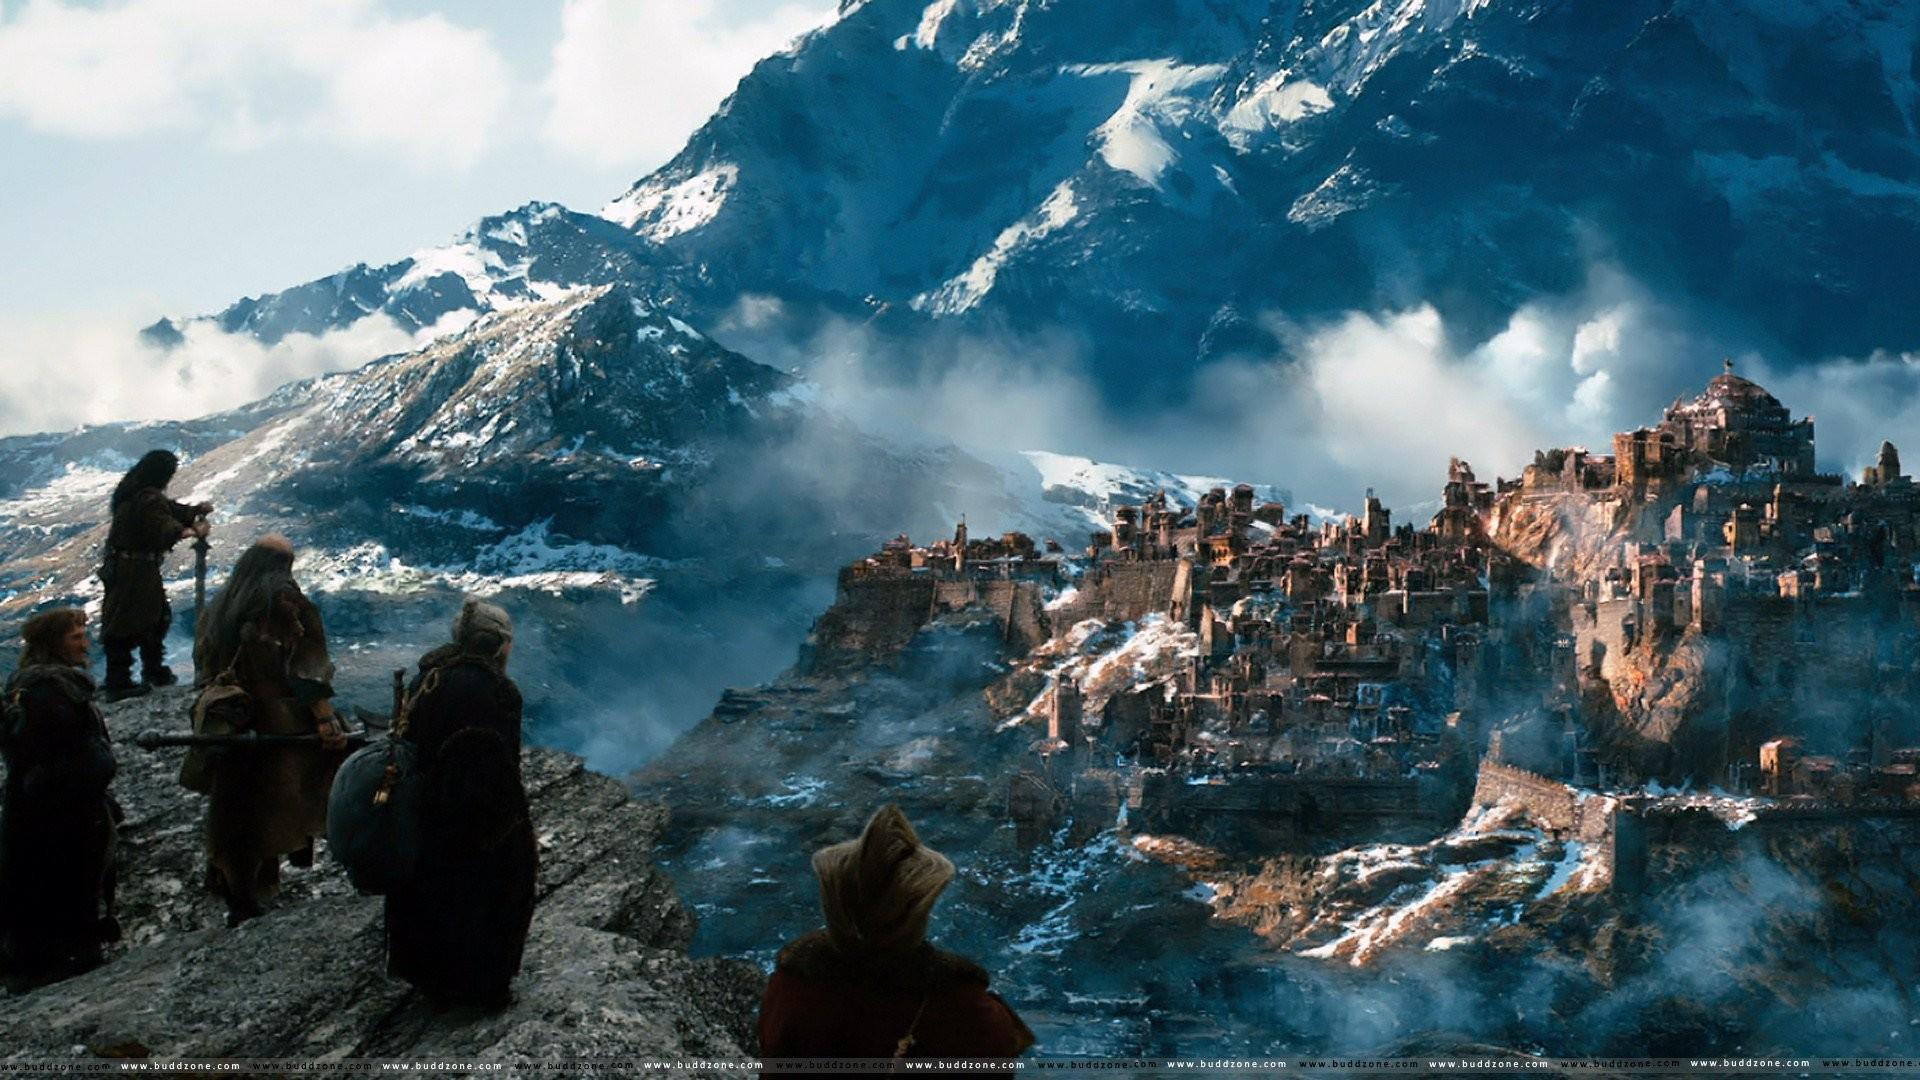 city-mountain-hobbit-lord-rings-lotr-fantasy-movie-film-smog-desolation- wallpaper-1.jpg 1 920 × 1 080 pixels | Cities photo realism | Pinterest |  Lord rings …